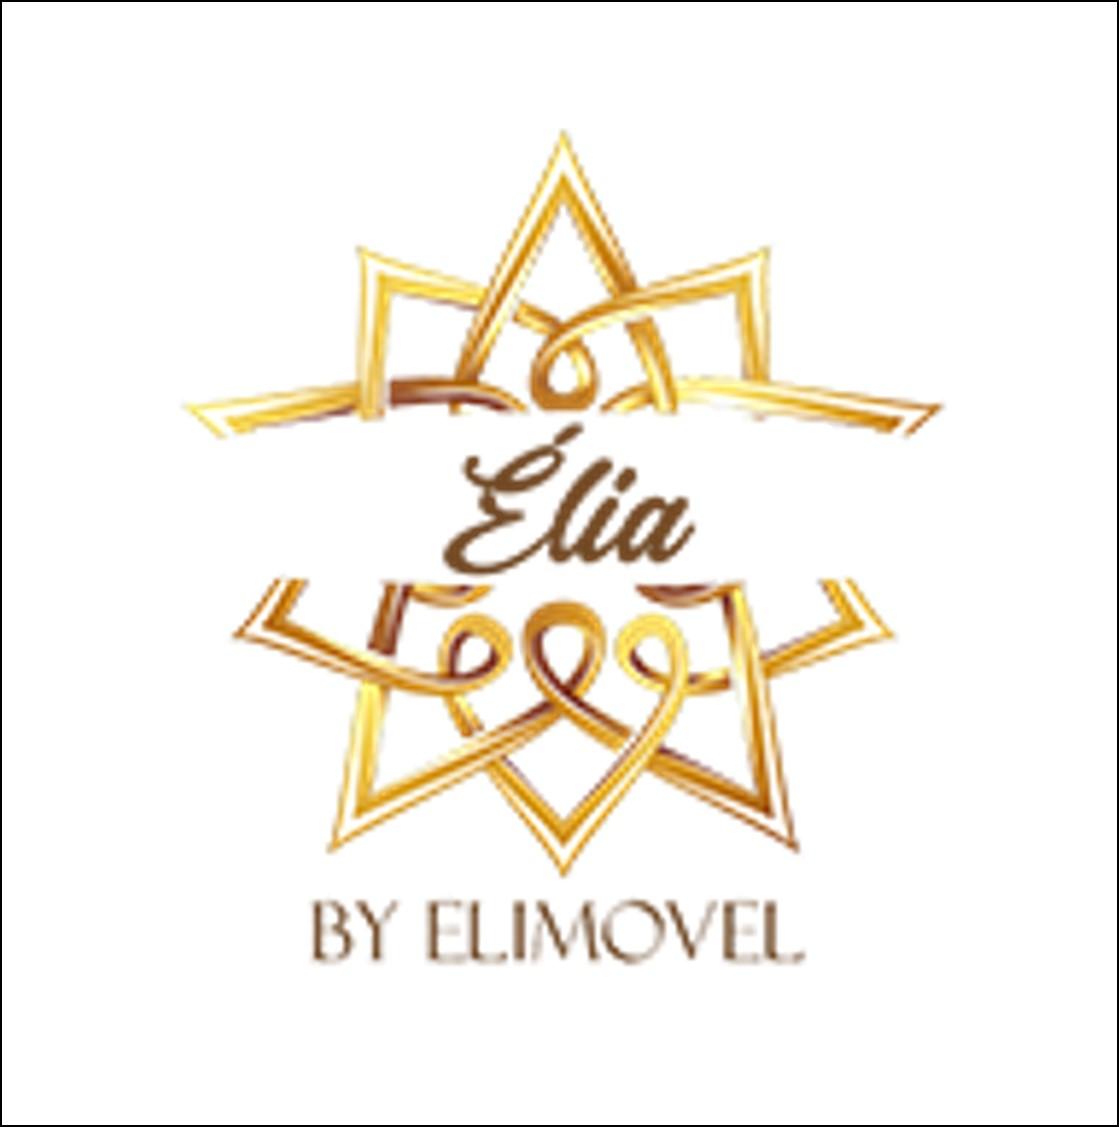 Elimovel